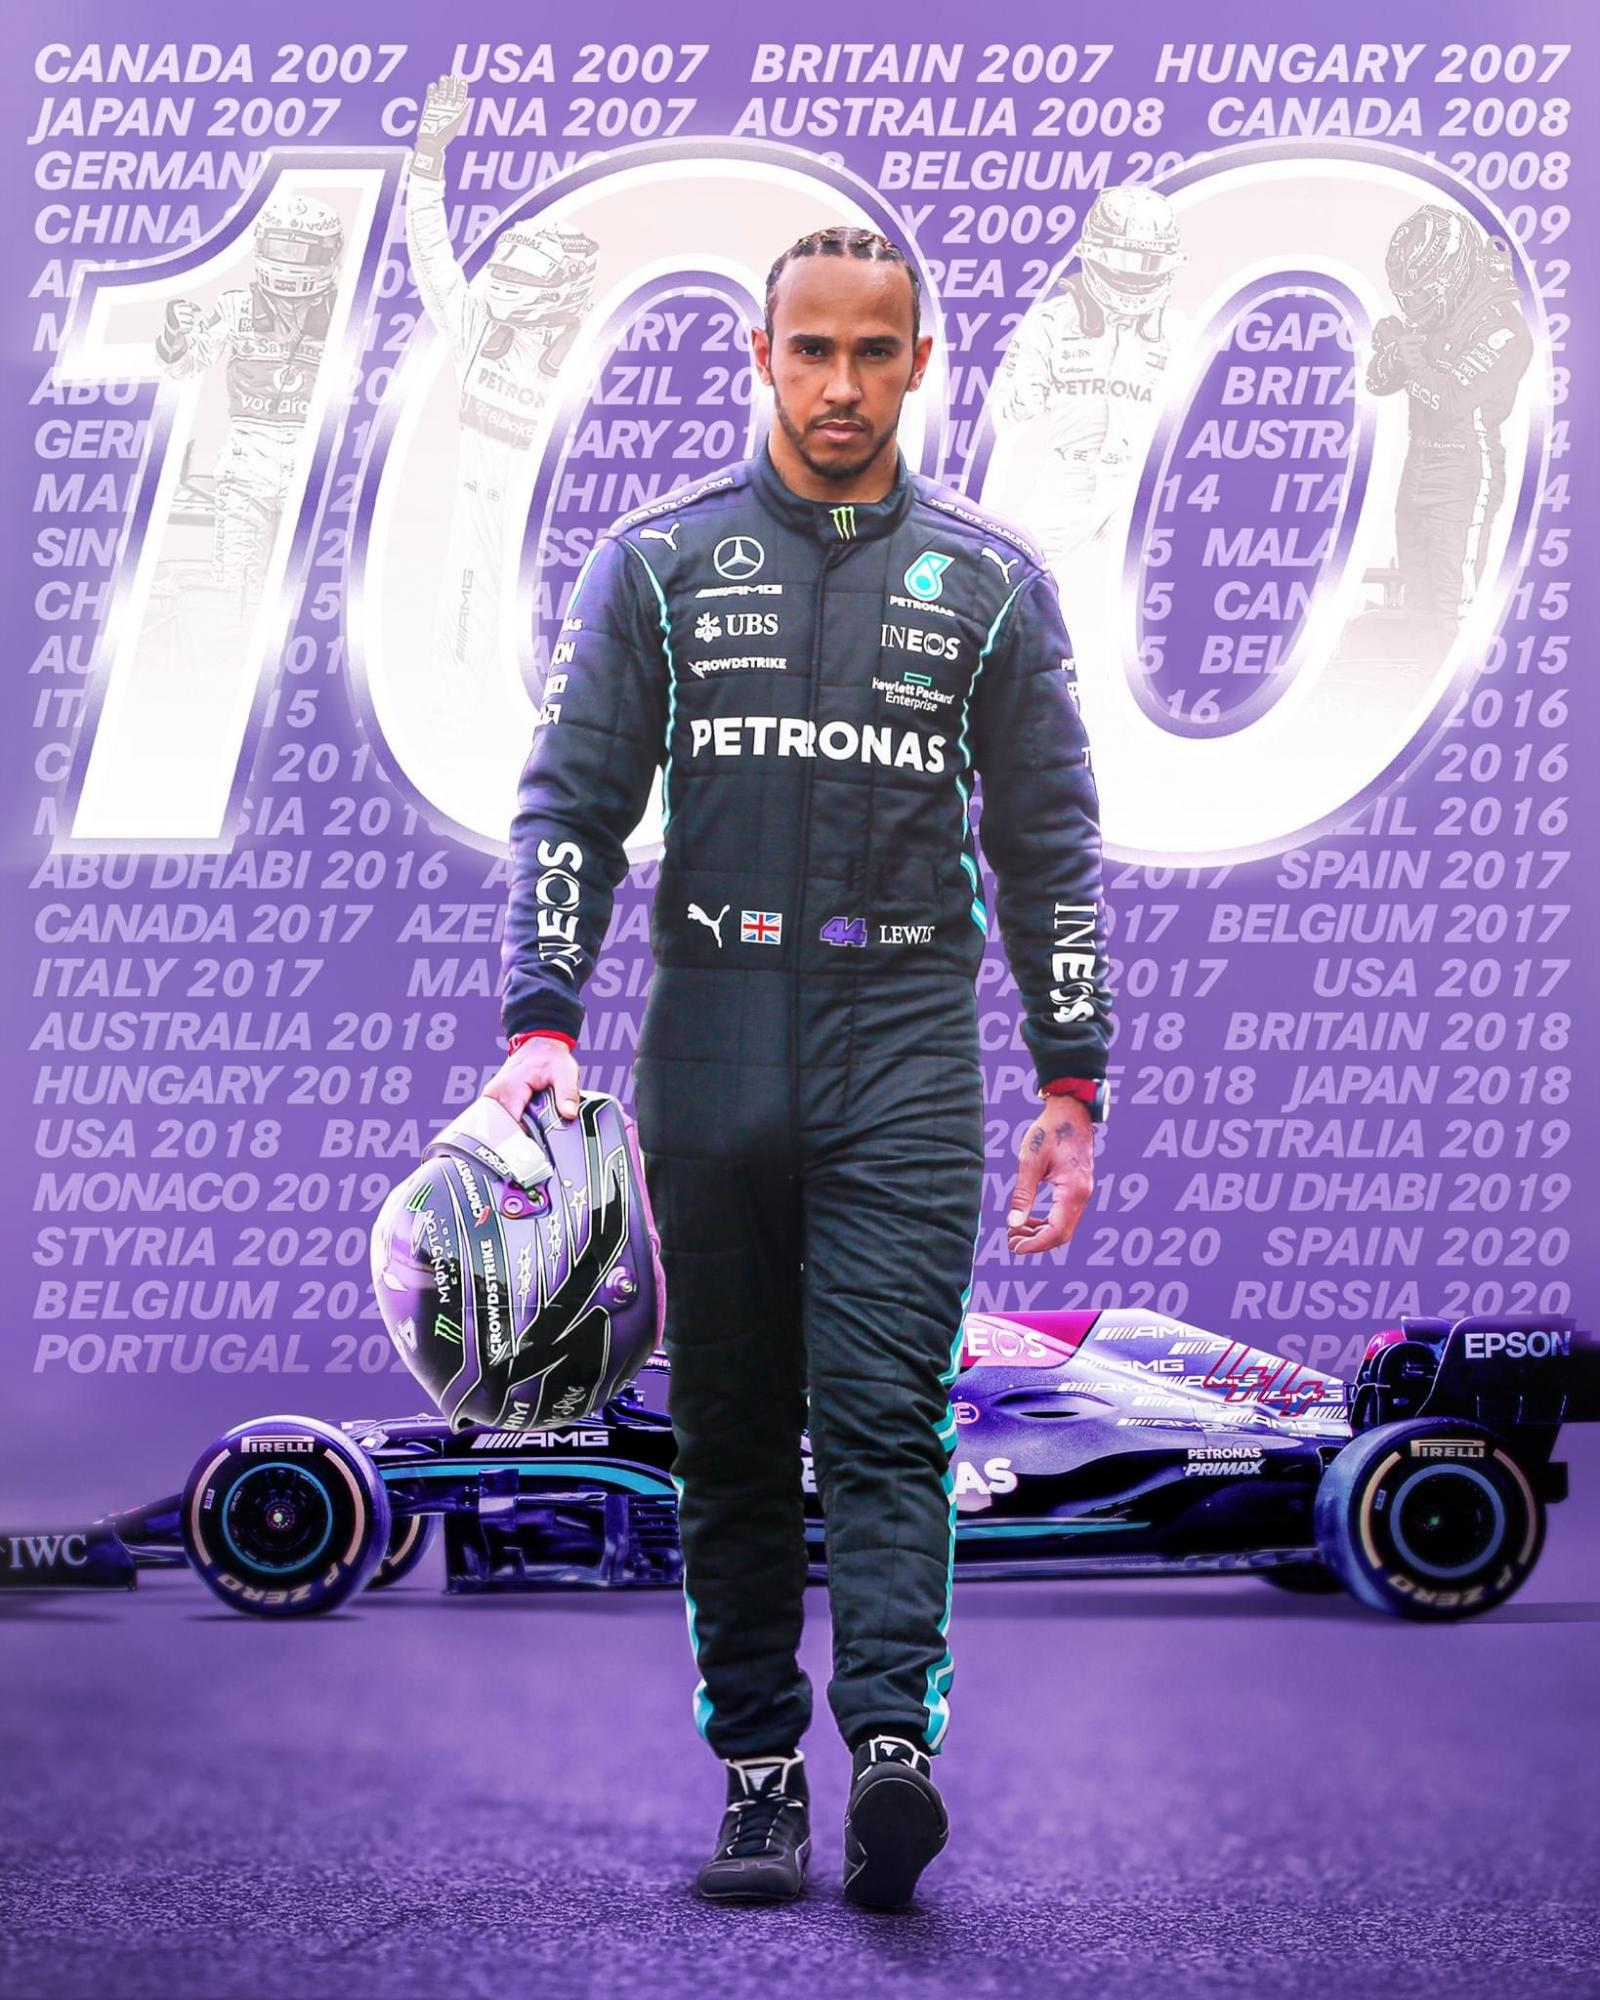 Hamilton 100